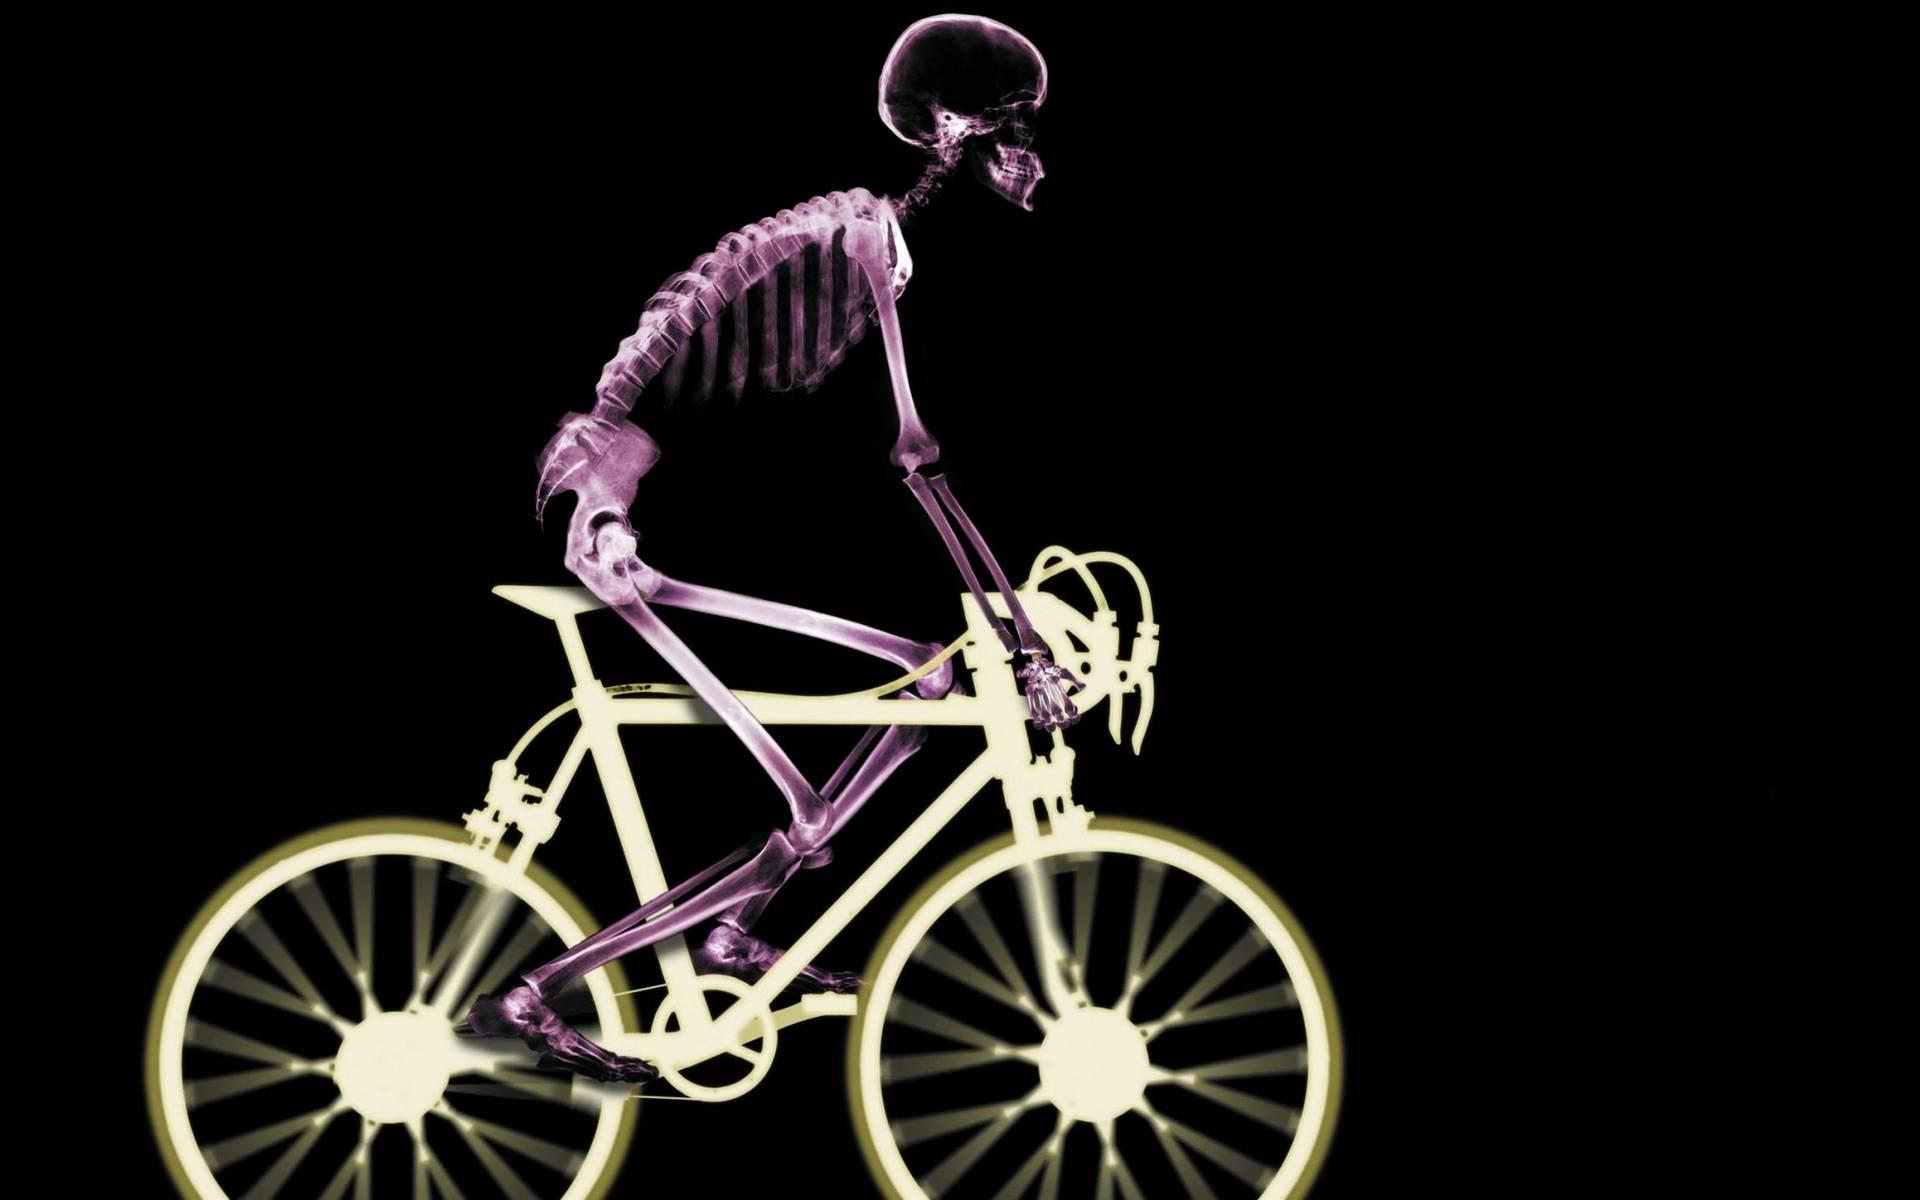 обои человек, скелет, велосипед, рентген картинки фото